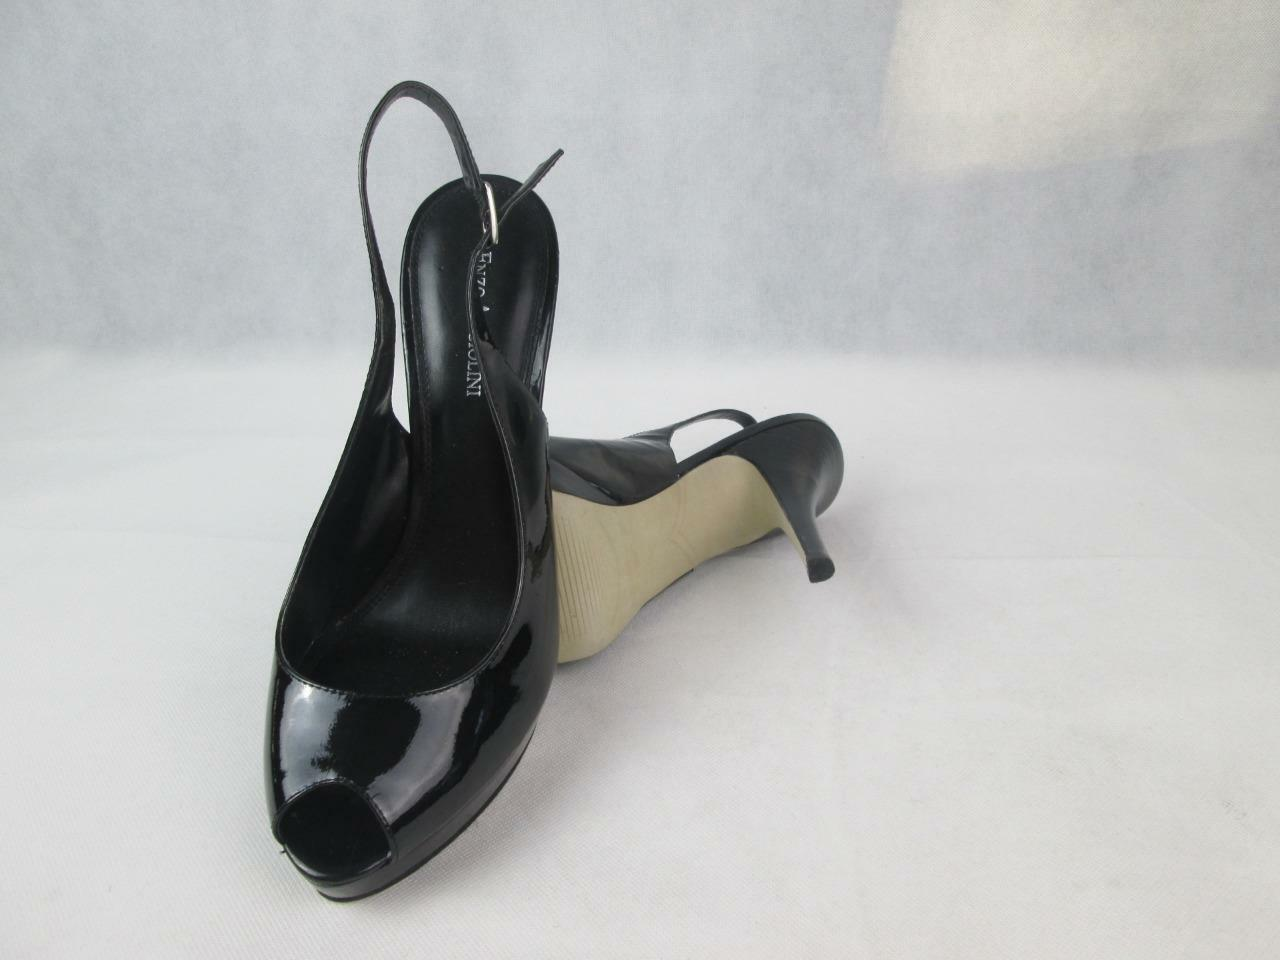 ENZO ANGIOLINI EASTARLIGHT schwarz schwarz schwarz PATENT LEATHER PLATFORM PEEP TOE HEELS 9M EUC 462ff3